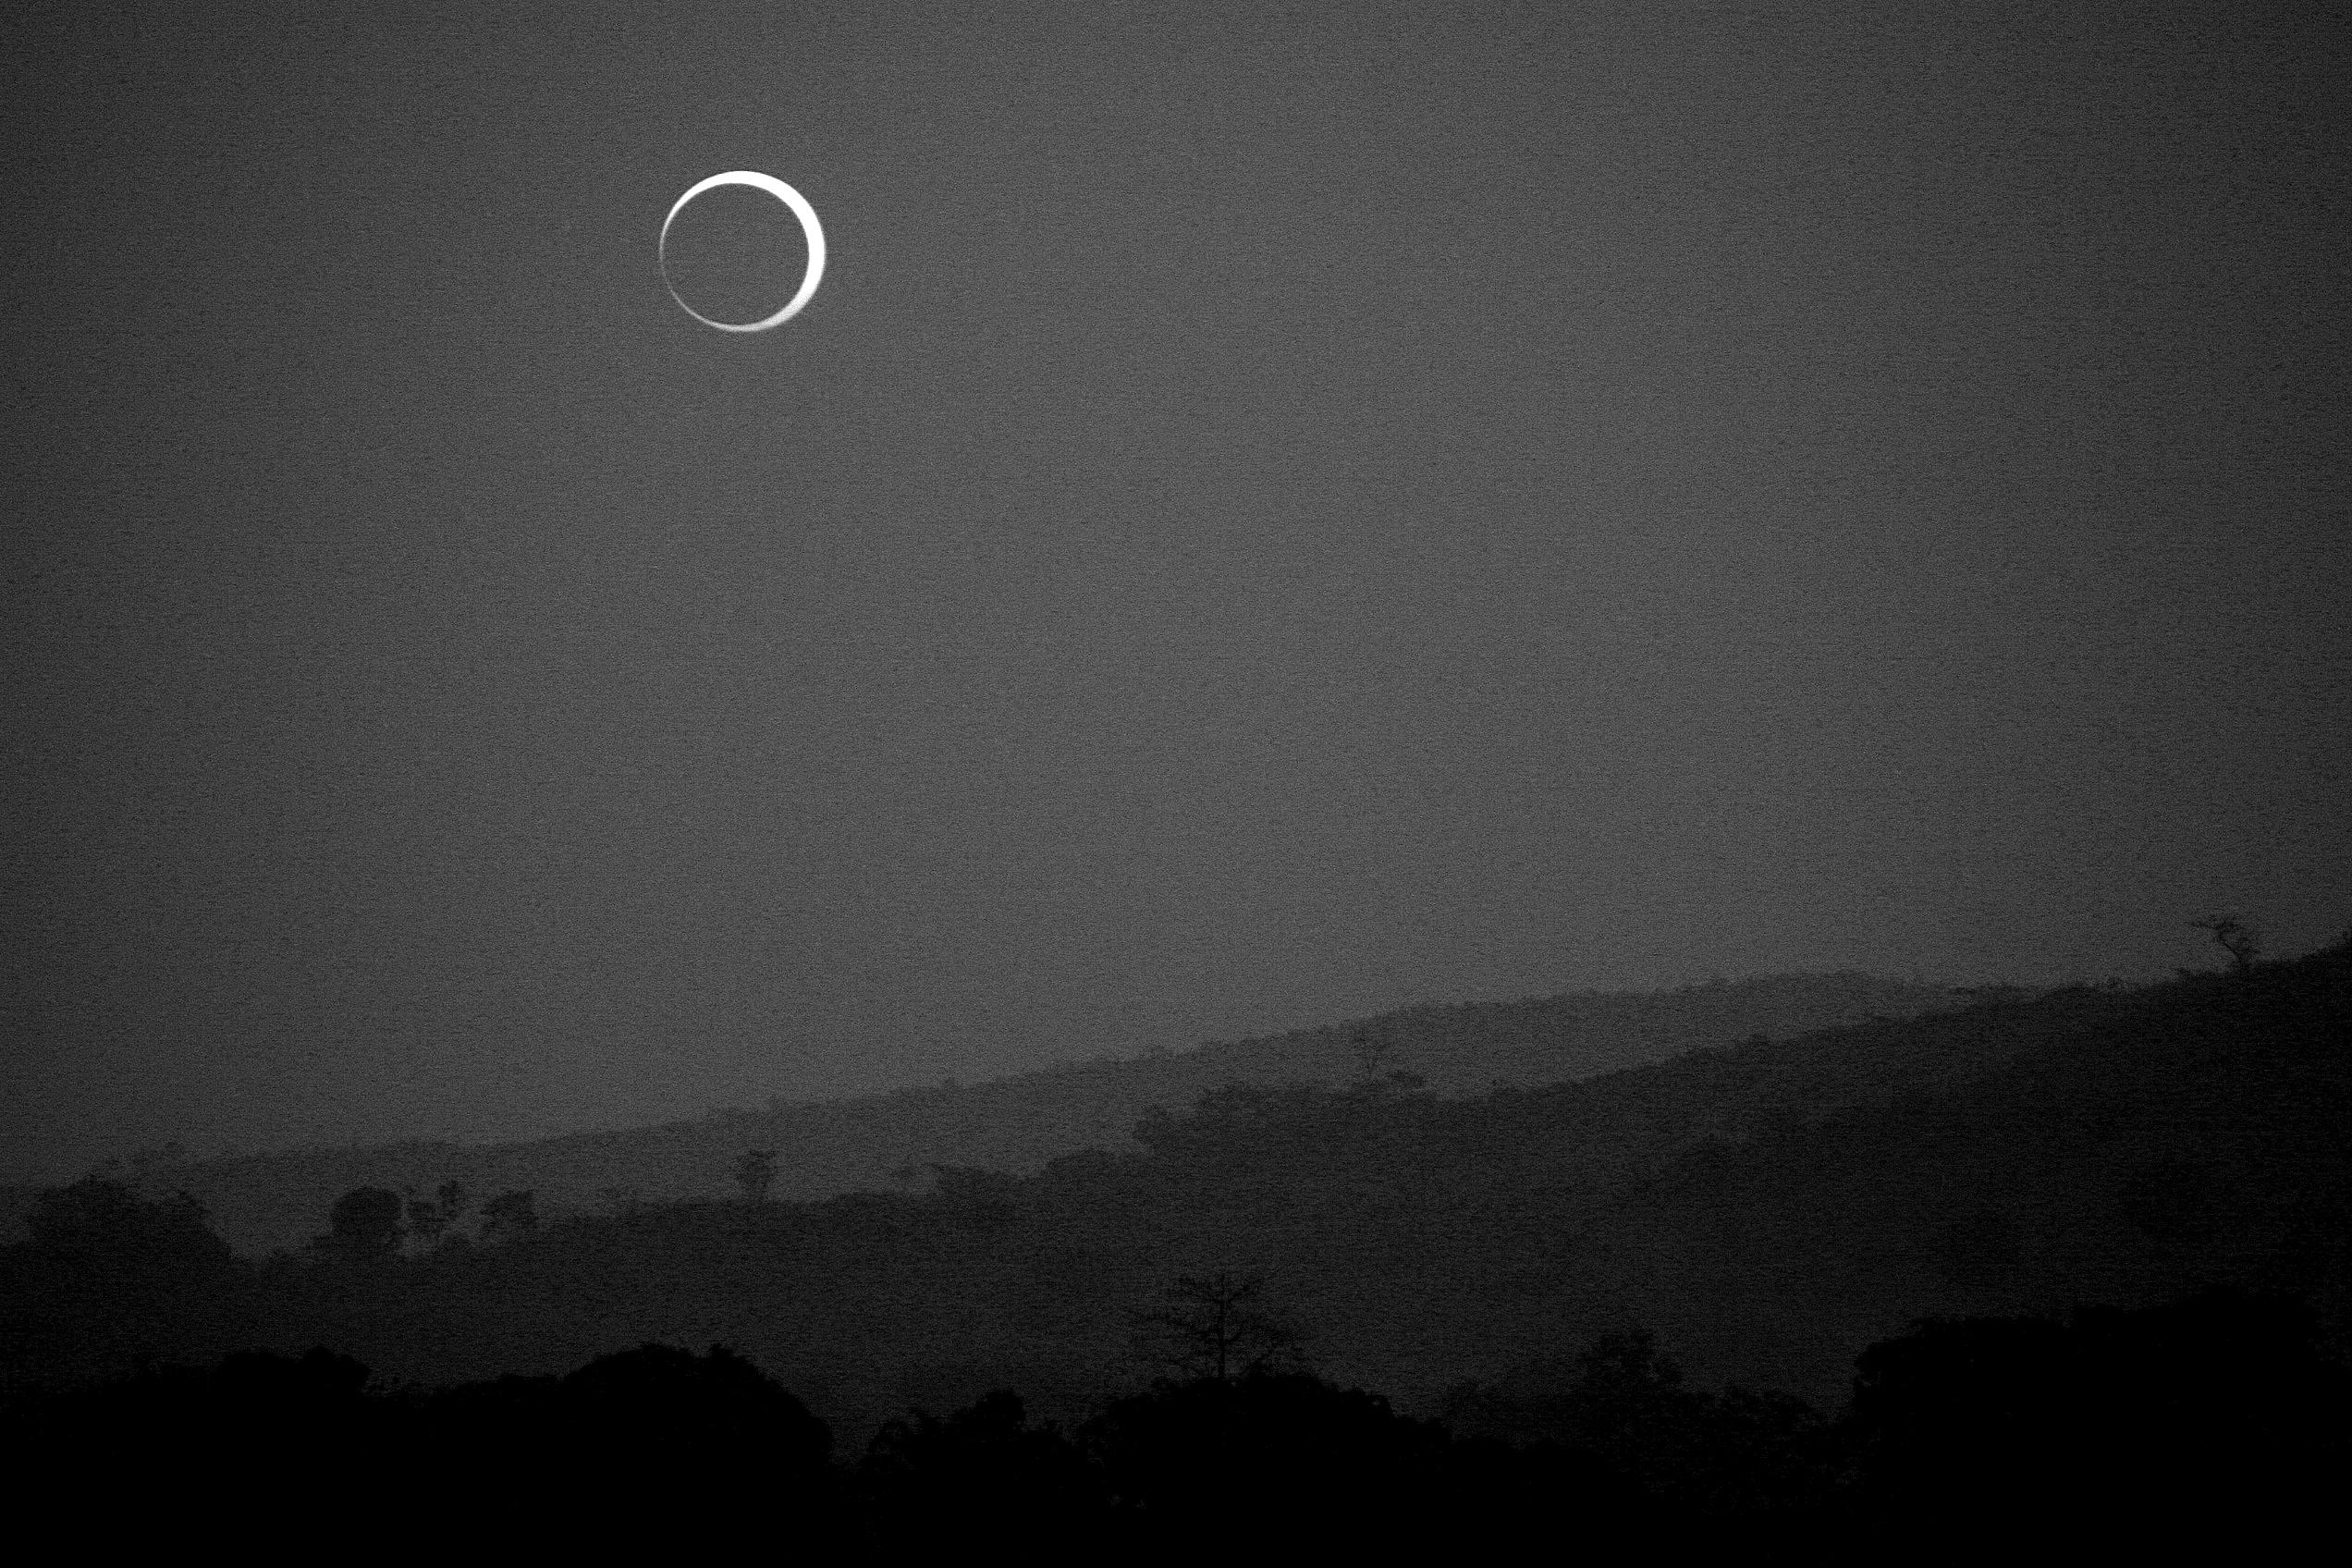 Solar Eclipse Time In Fort Walton Beach